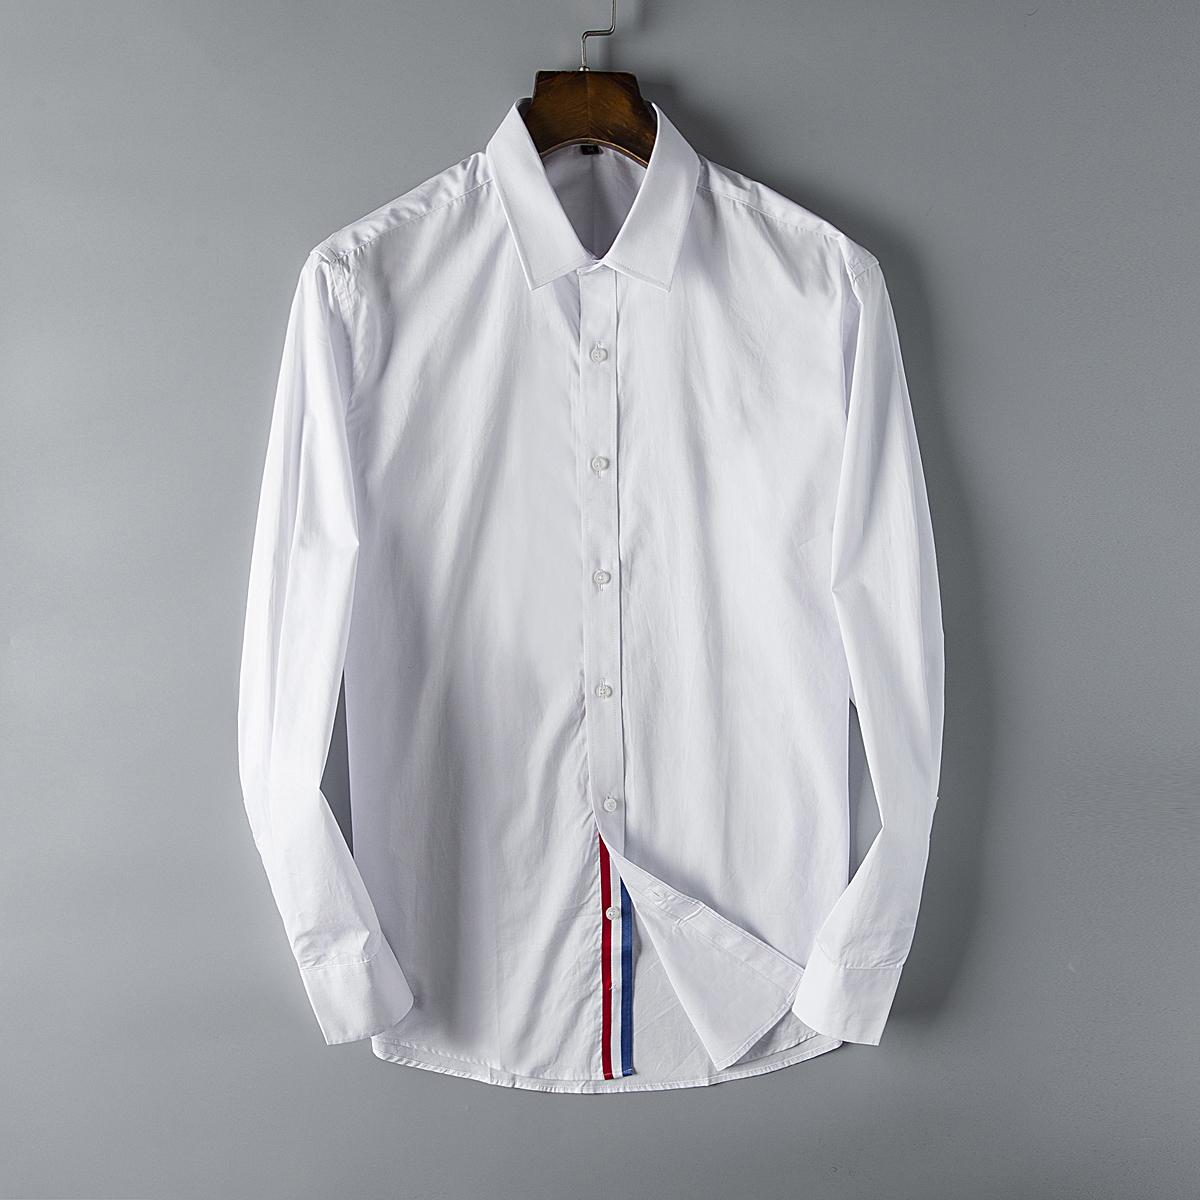 Designer Mens Shirts France Luxury Business Shirt Long Sleeve Brand